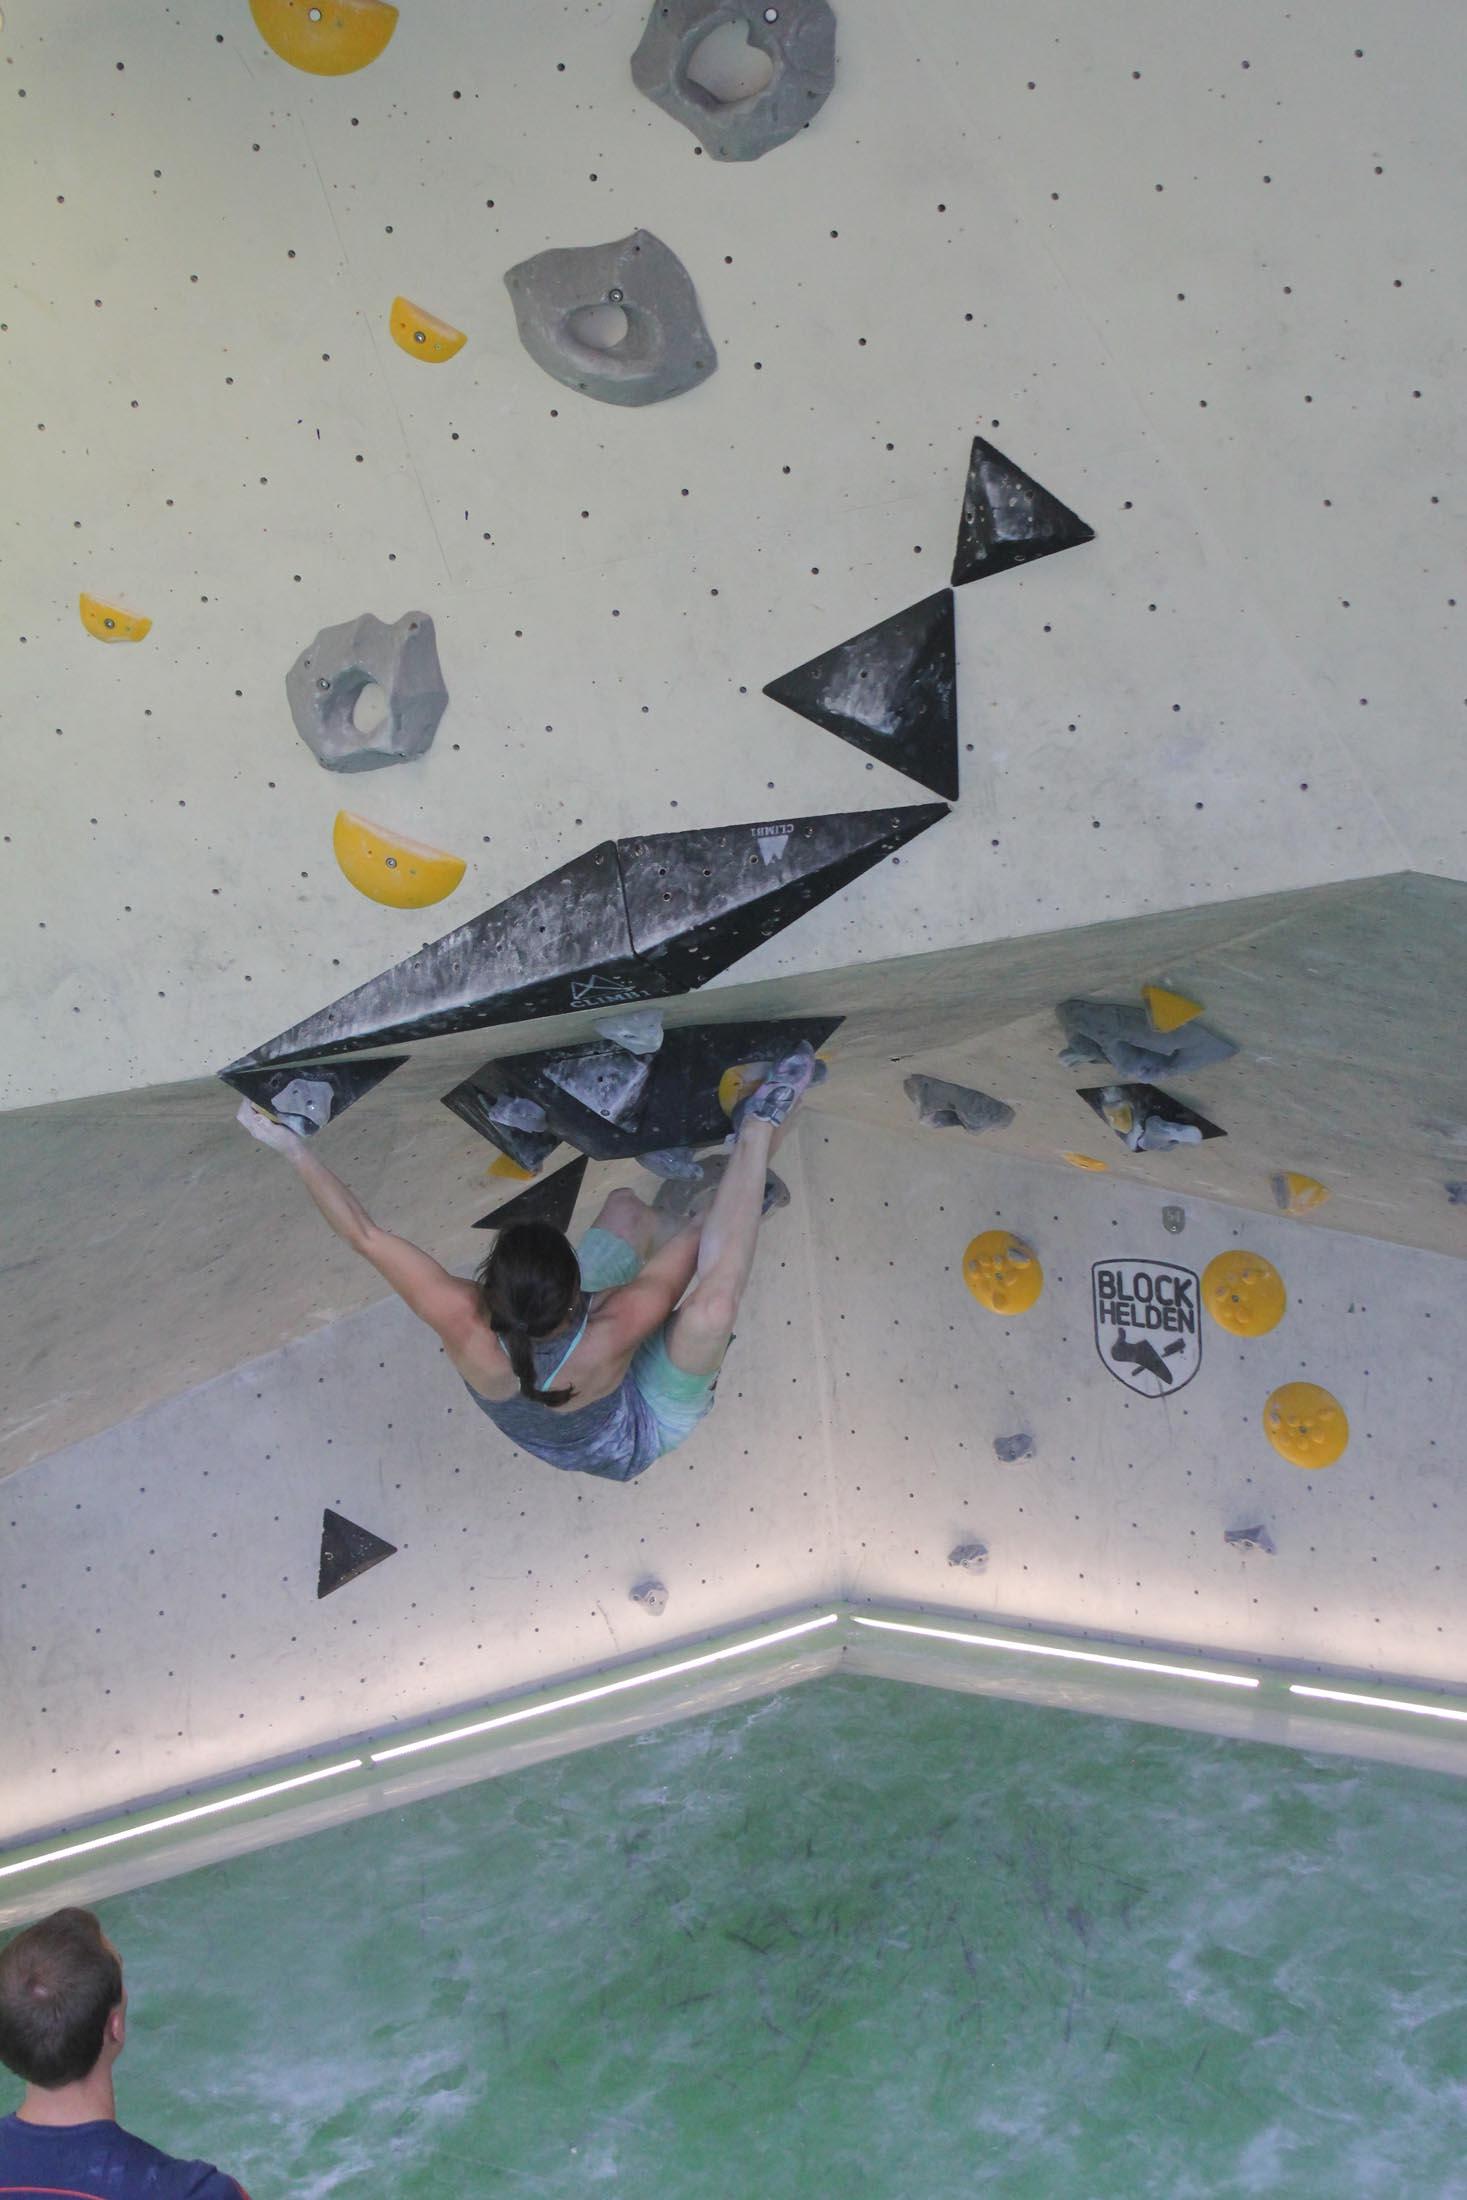 Quali, internationaler bouldercup Frankenjura 2016, BLOCKHELDEN Erlangen, Mammut, Bergfreunde.de, Boulderwettkampf07092016309